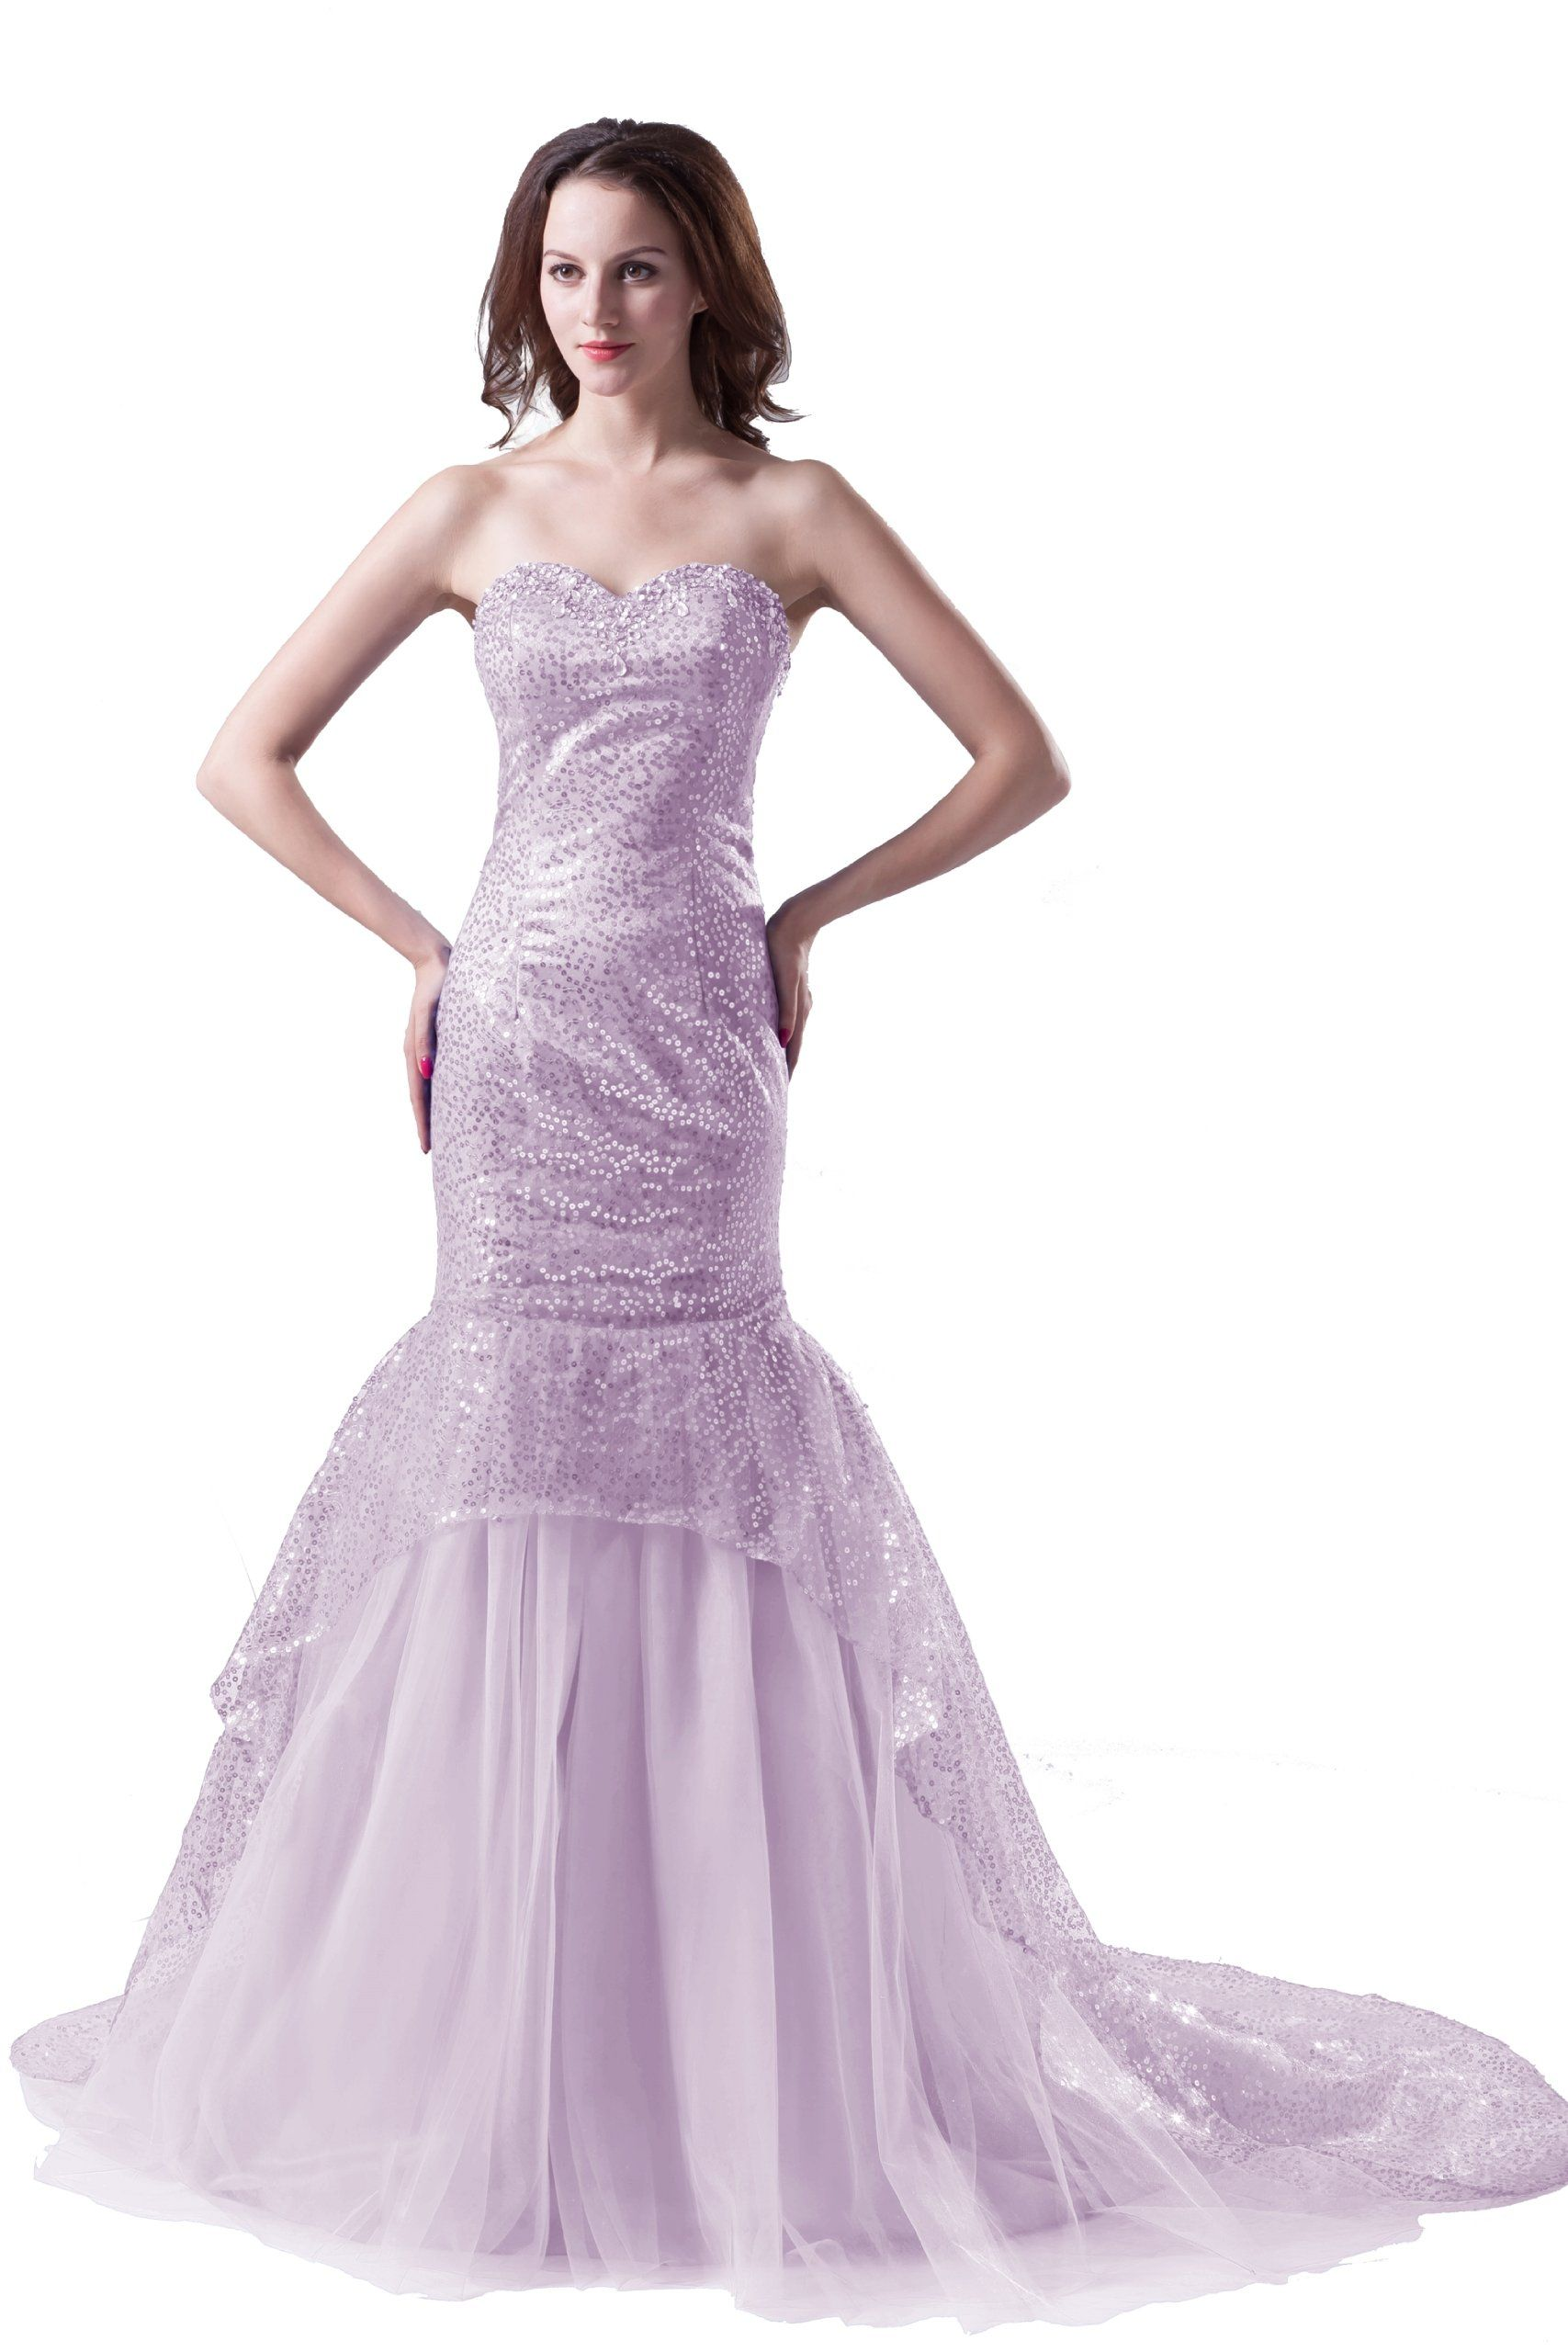 Dresstells 2013 Cheap Long Light Purple Mermaid Wedding Dress Gown Us Size 14 Light Purple Gowns Dresses Gown Wedding Dress Mermaid Formal Dress [ 2560 x 1707 Pixel ]